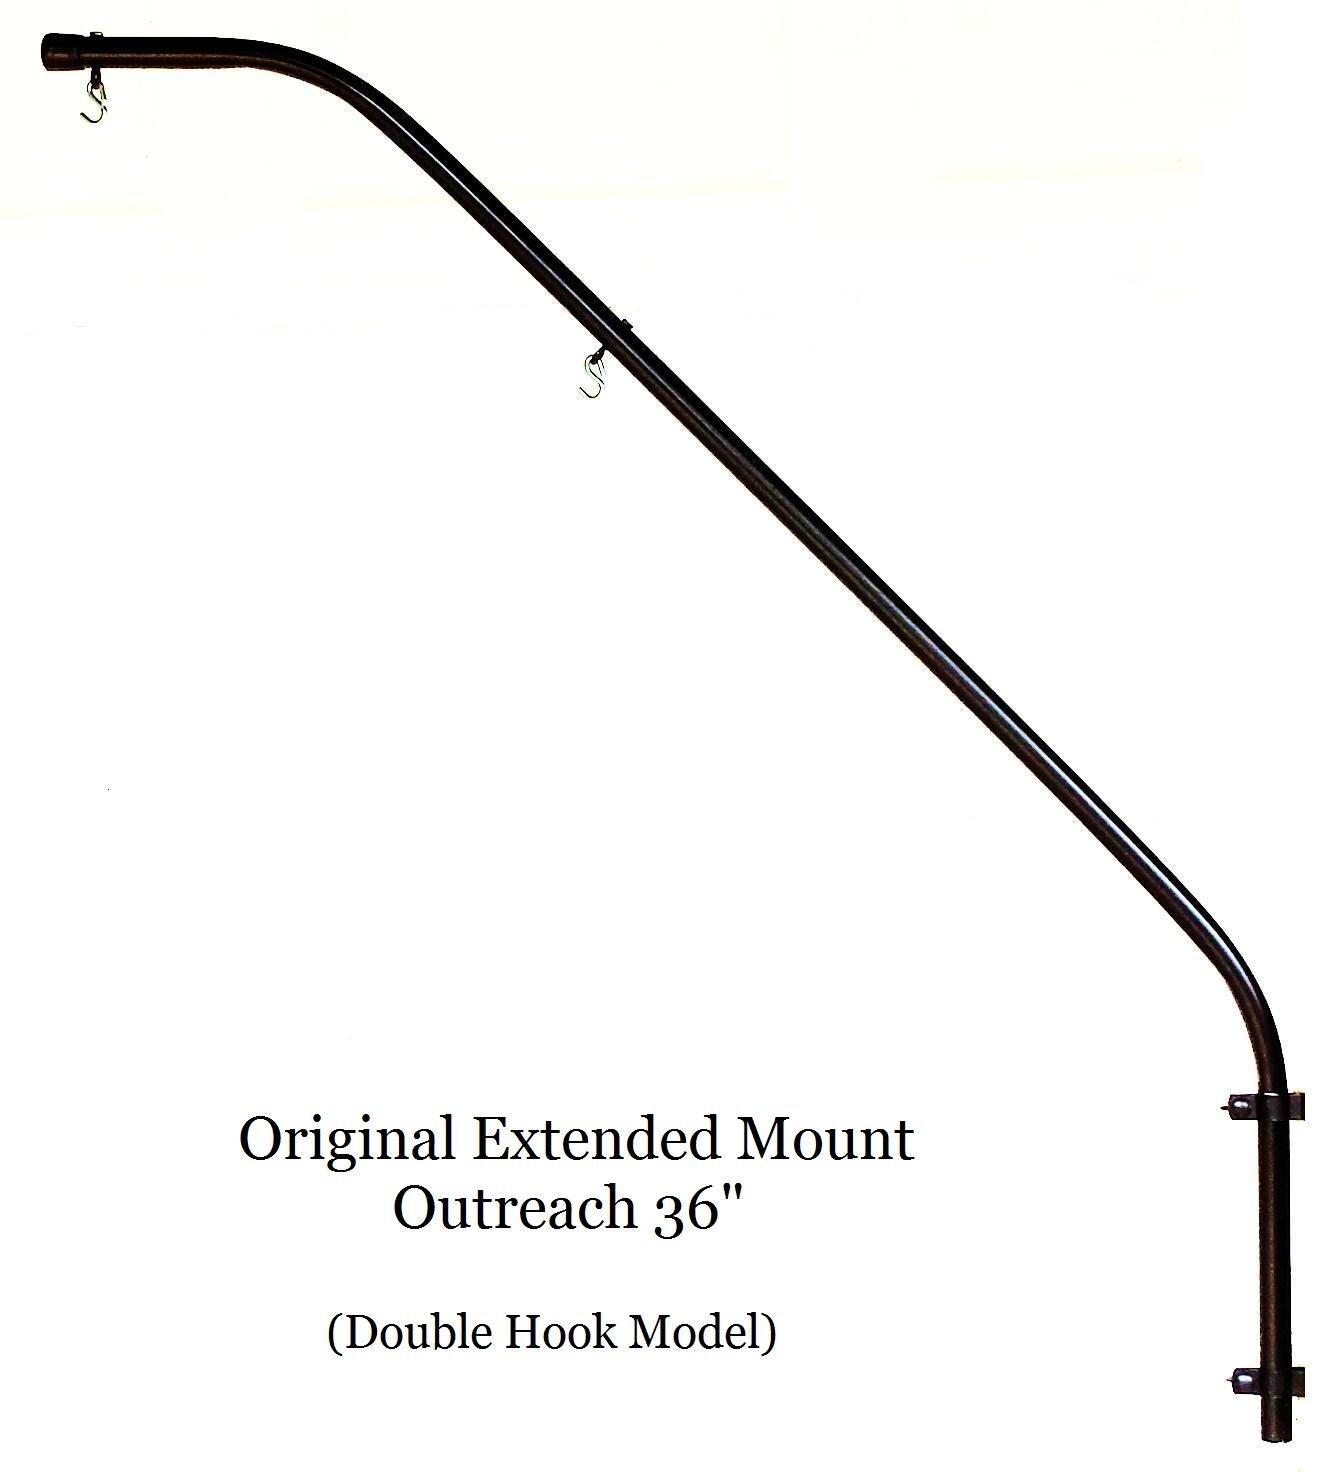 branches garden for select with wild dp bird metal outdoor stokes pole adjustable deck com amazon hangers two accessories feeder decks kit